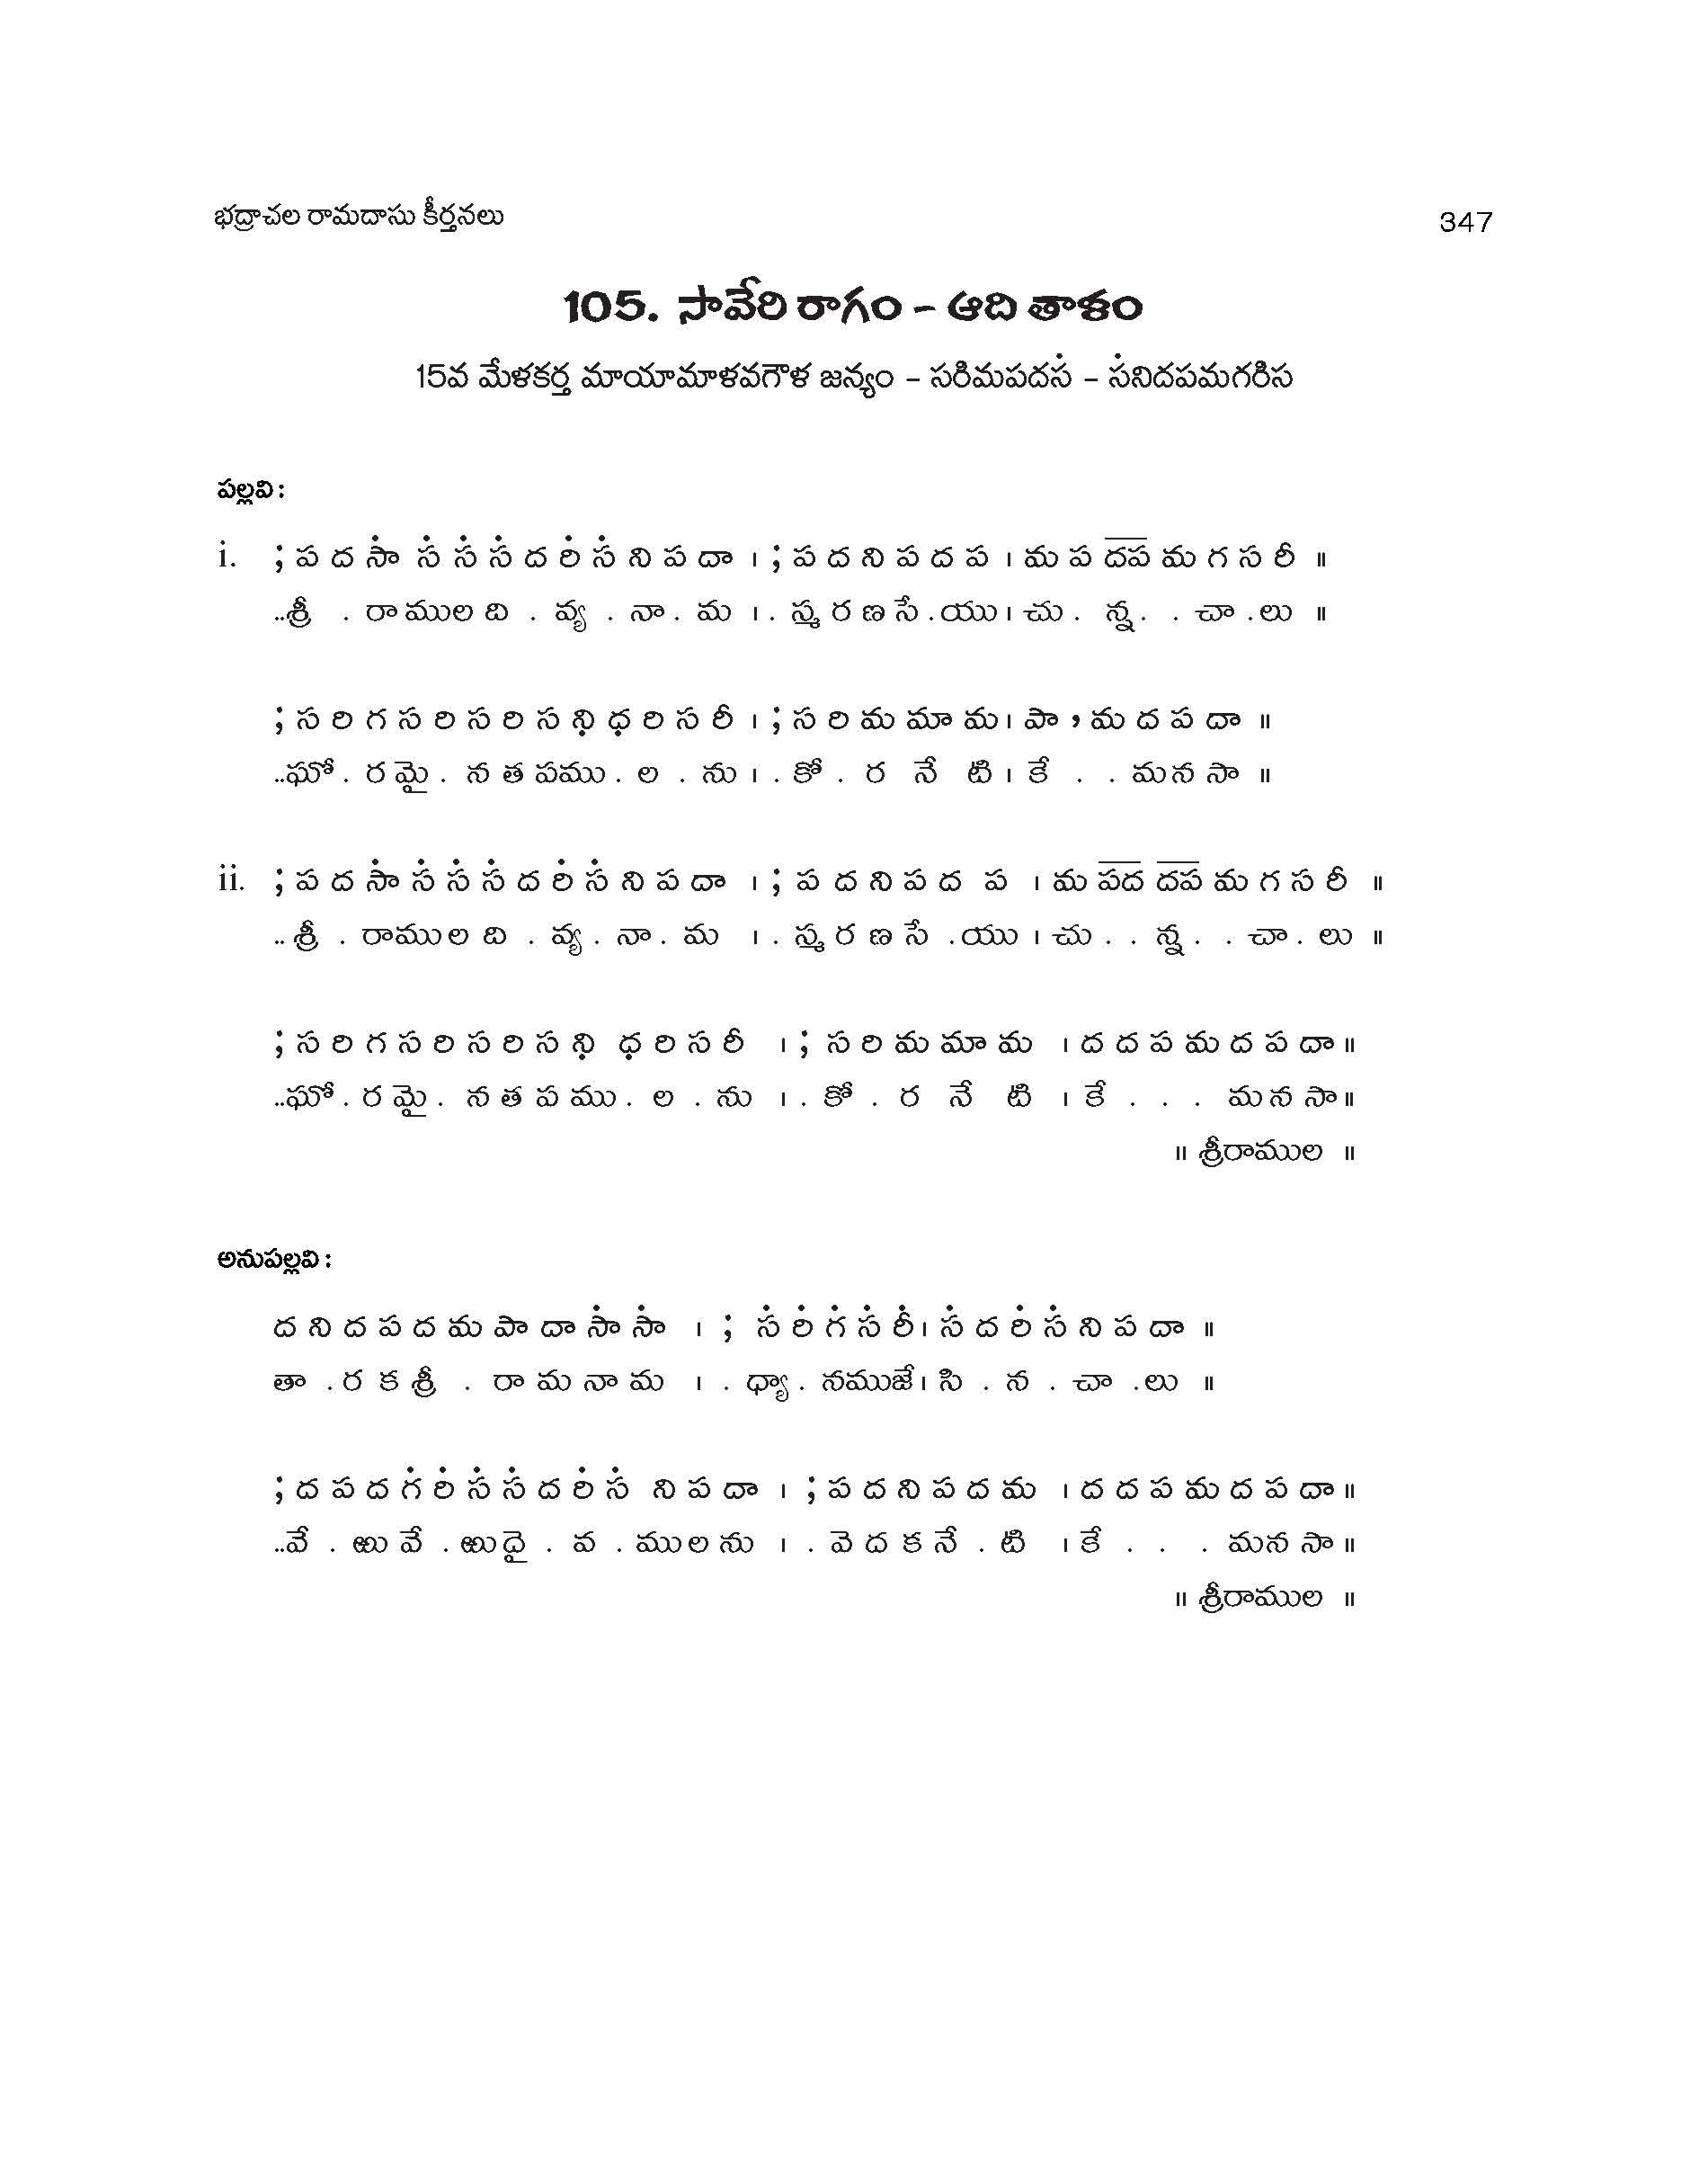 badhrachala ramadasu , badhrachalam, ramadasu jayanthi , ramadasu keerthanalu , ramadasu navarthna keerthanalu , ramadasu 108 keerthanalu